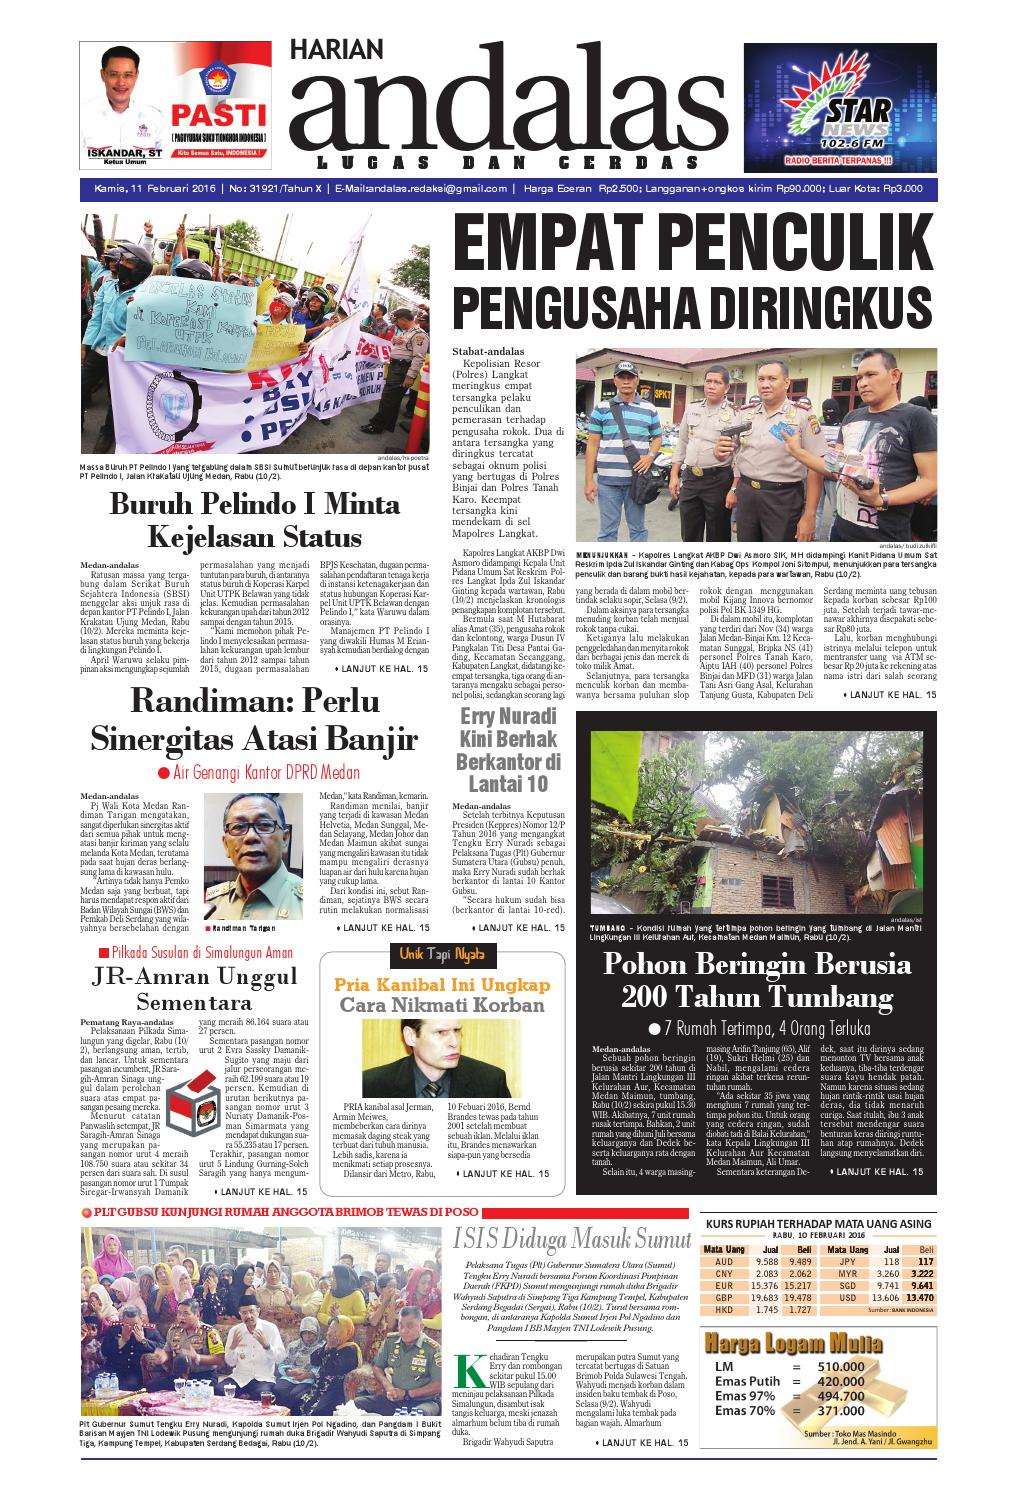 Epaper Andalas Edisi Kamis 11 Februari 2016 By Media Issuu Fcenter Lemari Pakaian Wd Hk 1802 Sh Jawa Tengah